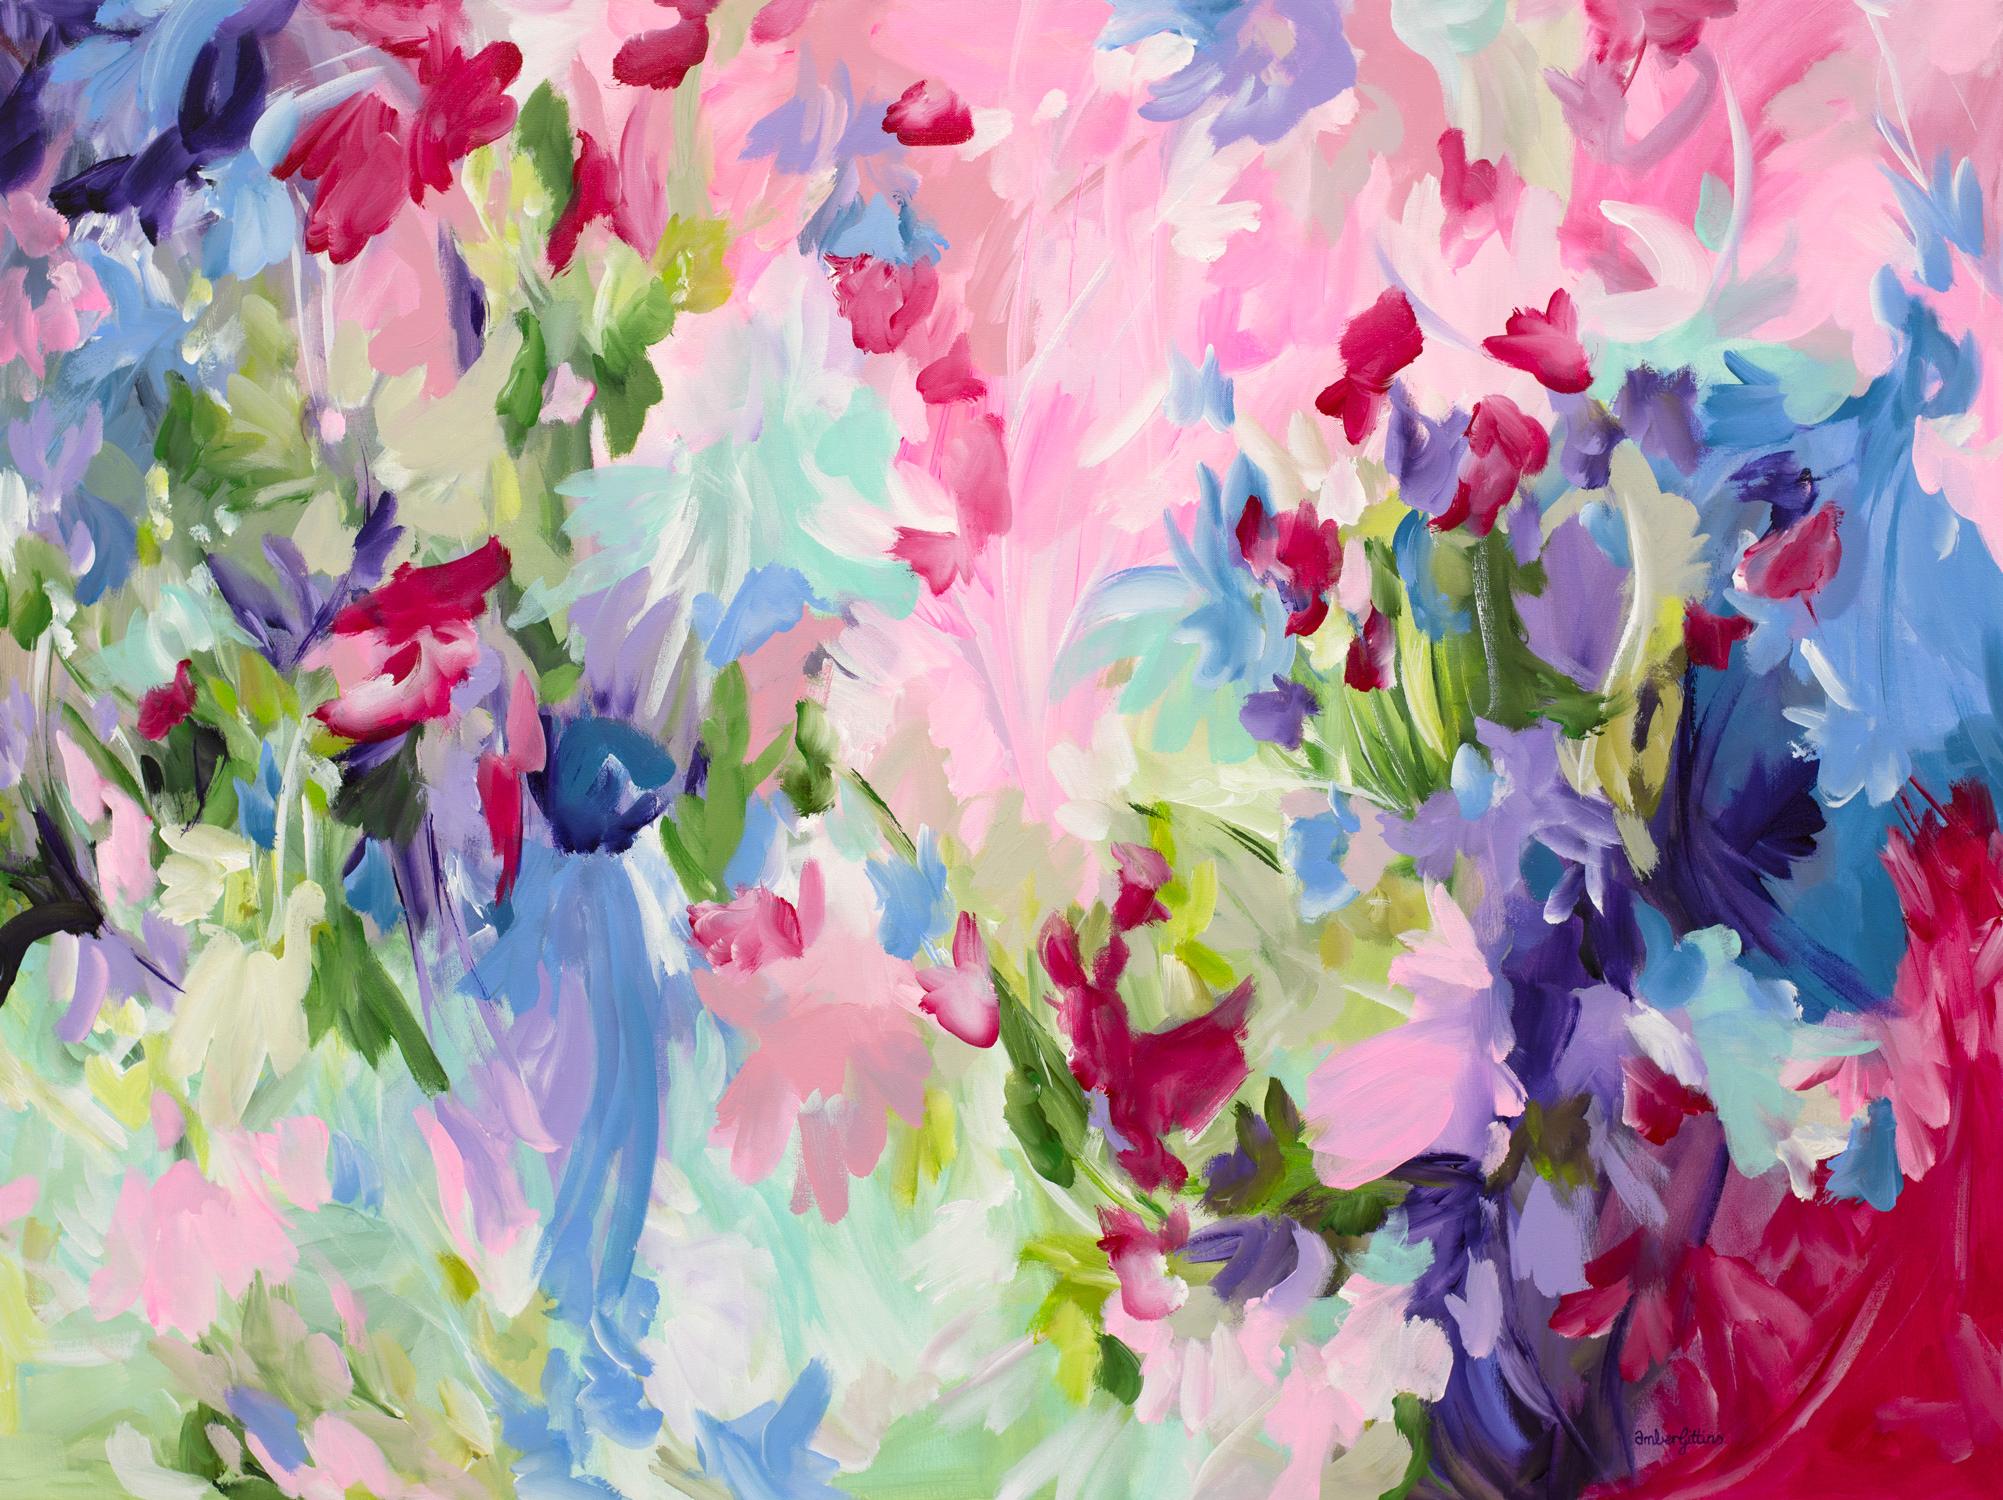 Confetti Crush By Amber Gittins